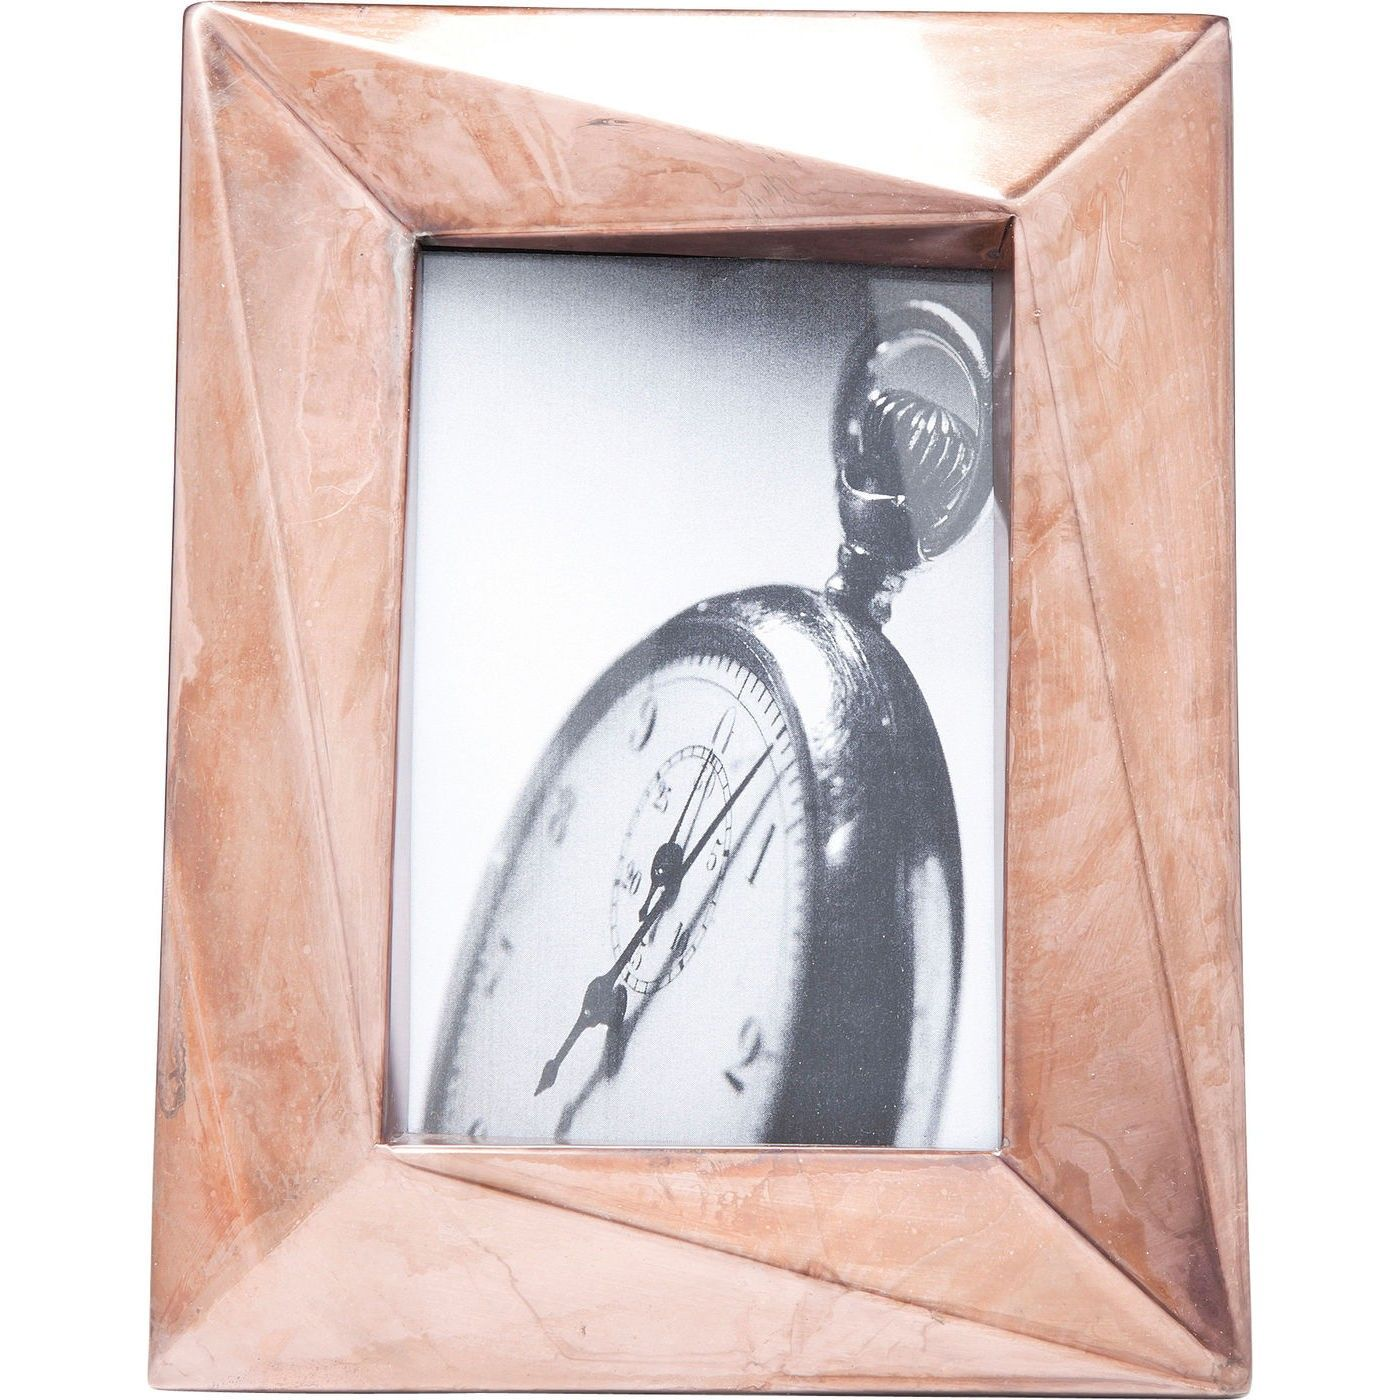 Rahmen Rifugio Copper 10x15cm | Walls | Pinterest | Rahmen